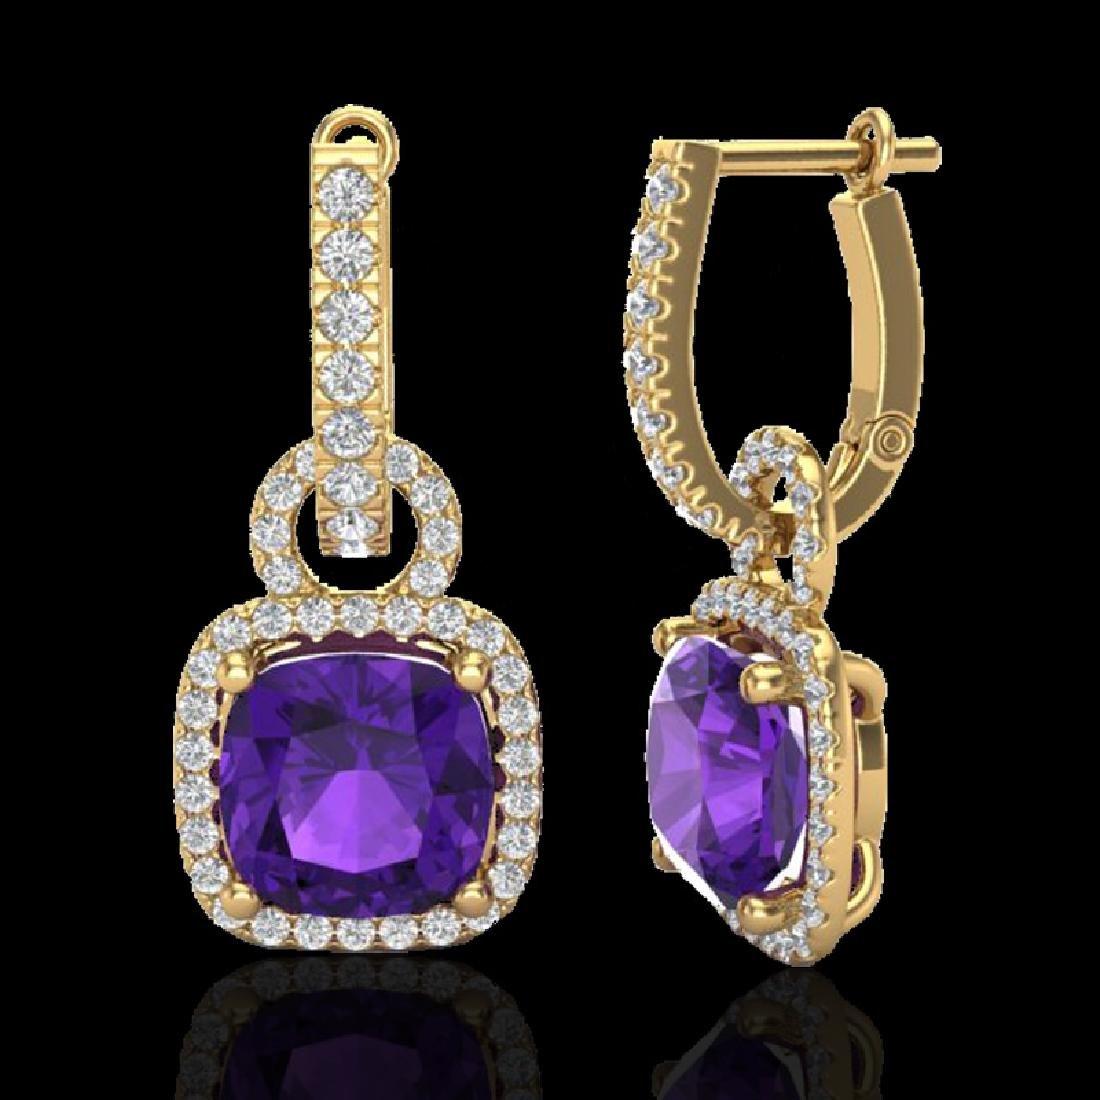 7 CTW Amethyst & Micro Pave VS/SI Diamond Earrings 18K - 2